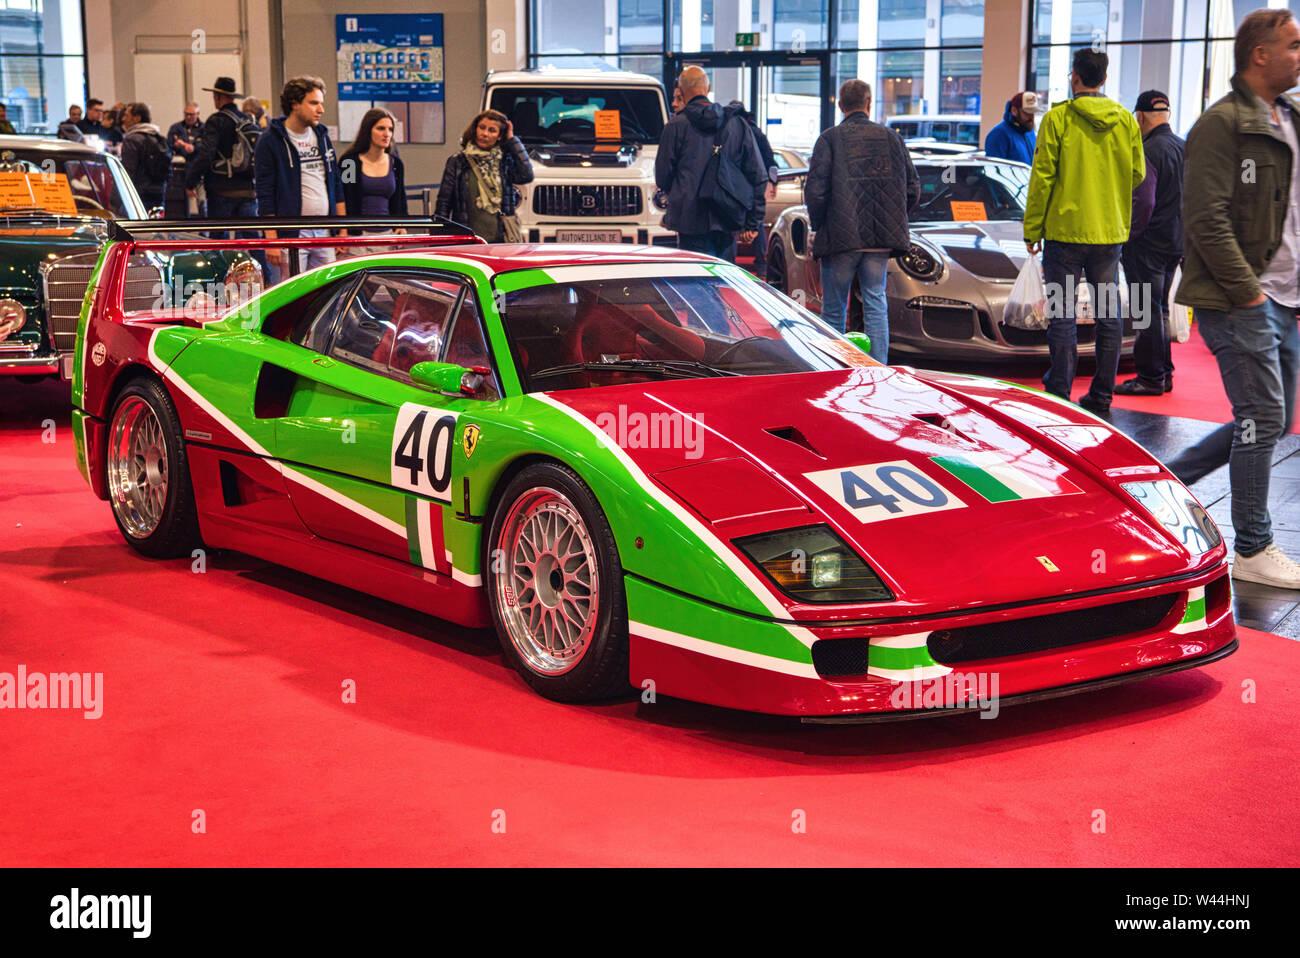 Friedrichshafen May 2019 Red Green Ferrari F40 1989 At Motorworld Classics Bodensee On May 11 2019 In Friedrichshafen Germany Stock Photo Alamy